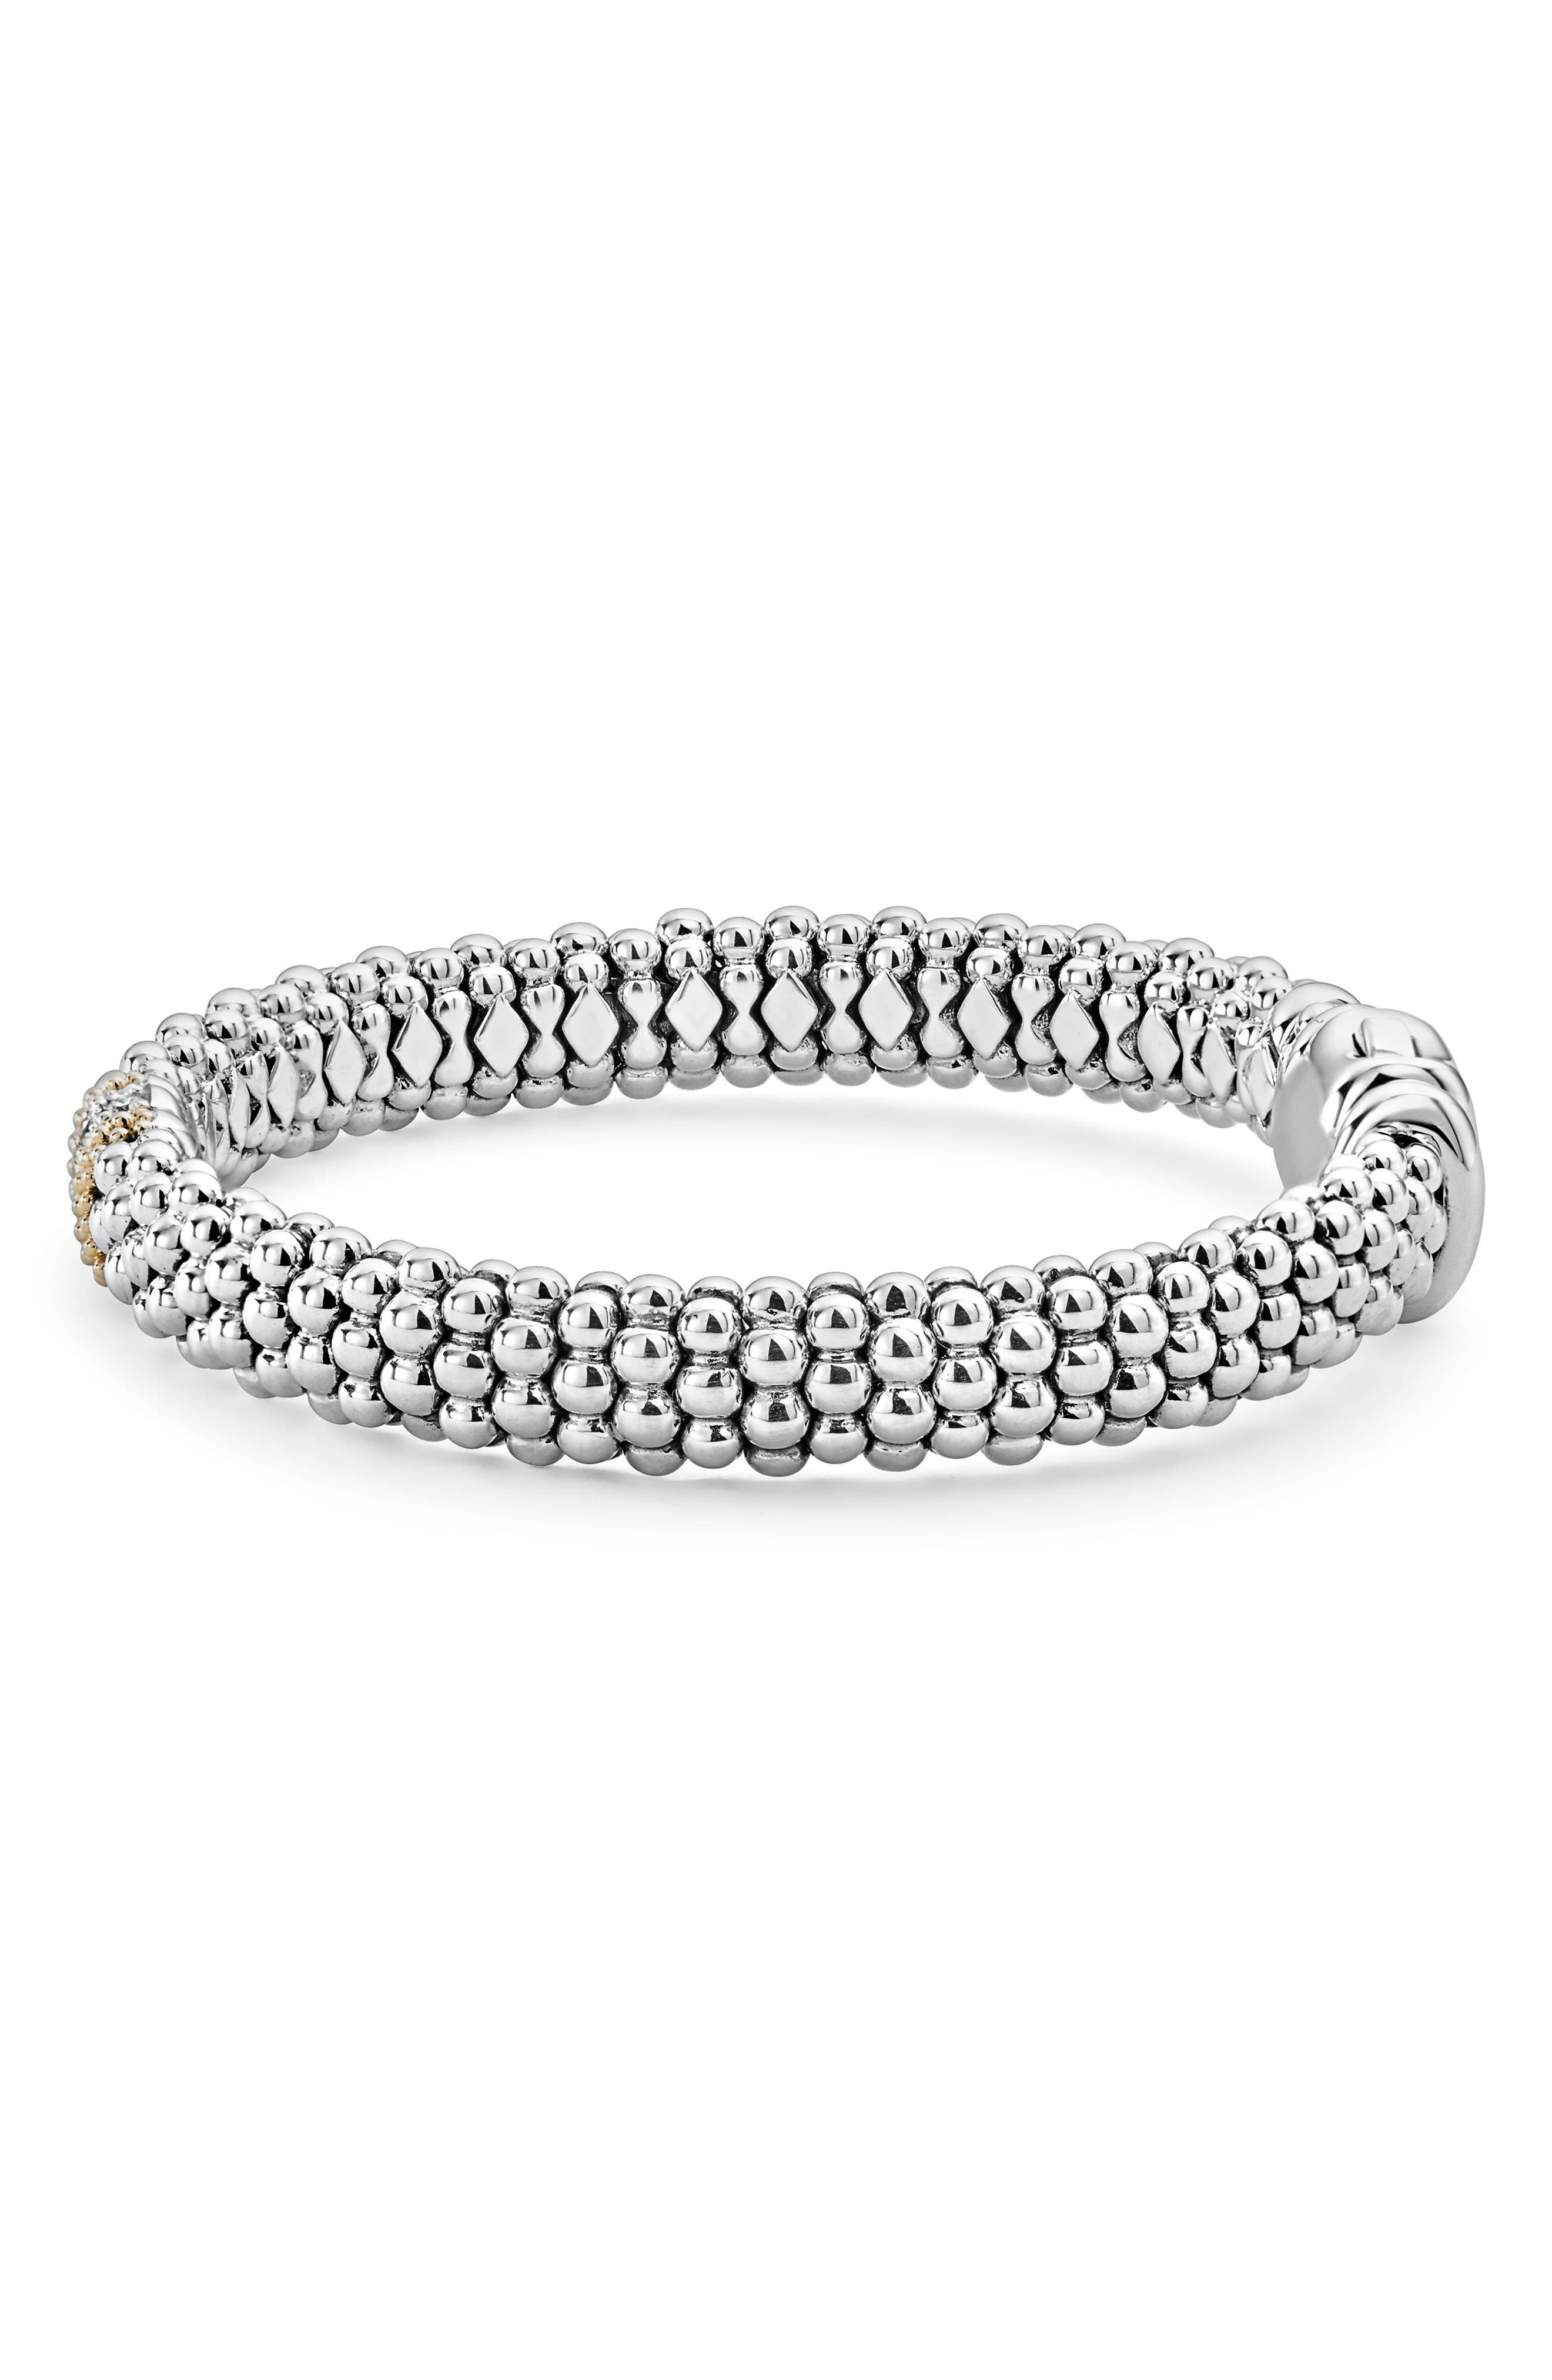 Luxe Pavé Diamond 9mm Bracelet,                             Alternate thumbnail 5, color,                             Diamond 2